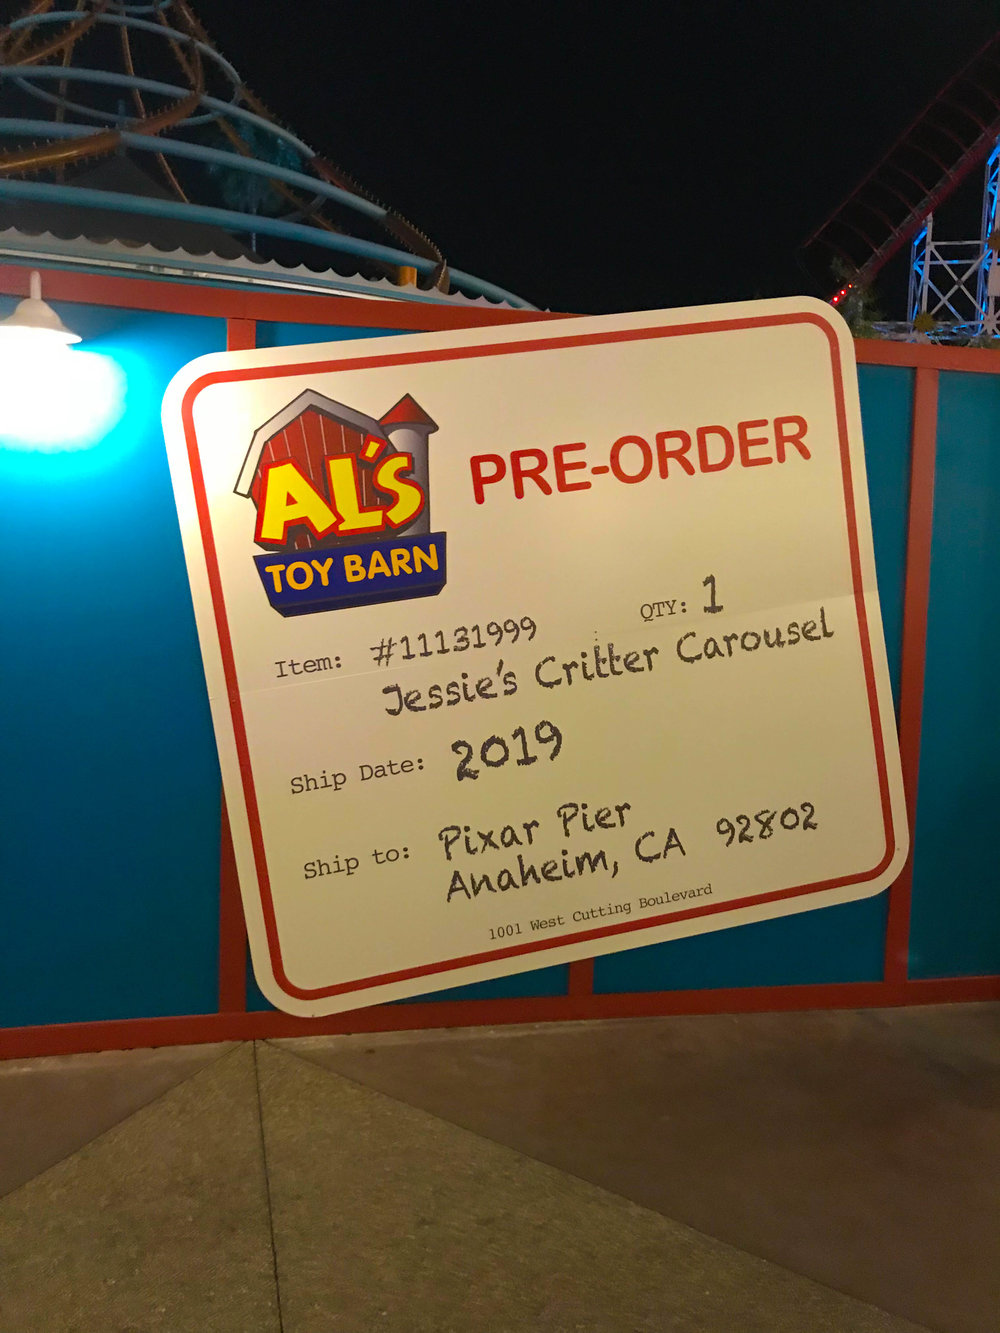 Disneyland_Pixar_Fest - Jessie's Critter Carousel Coming Soon